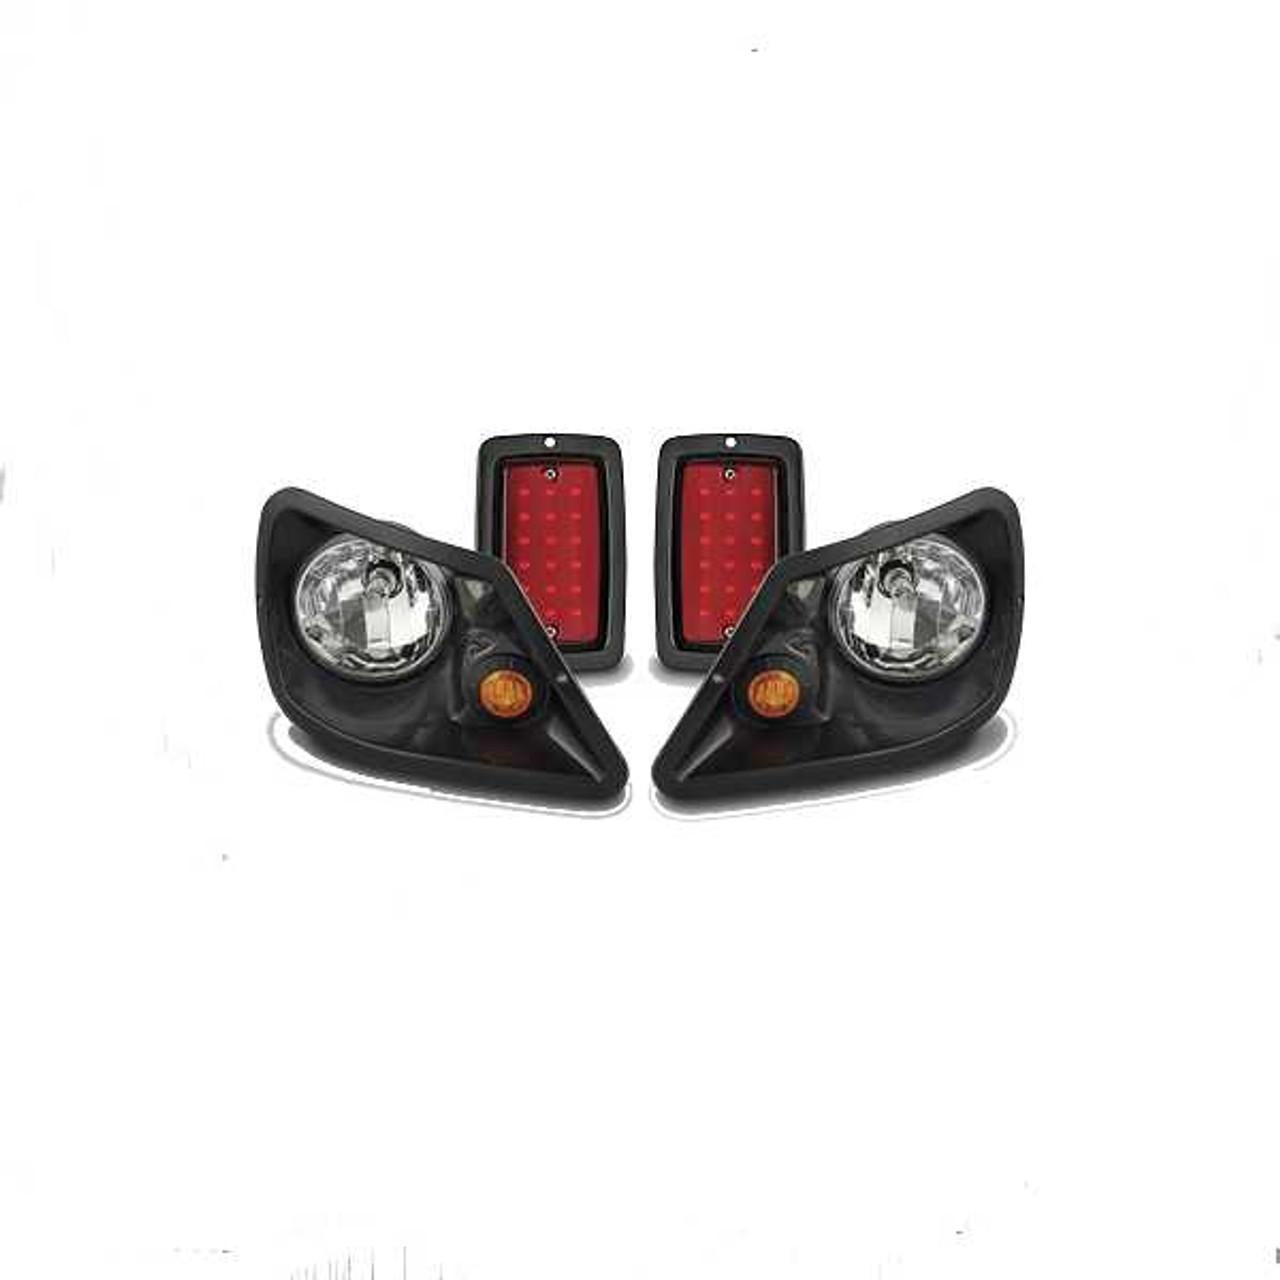 Standard LED Spartan/Titan Light Kit Included Wiring Harness